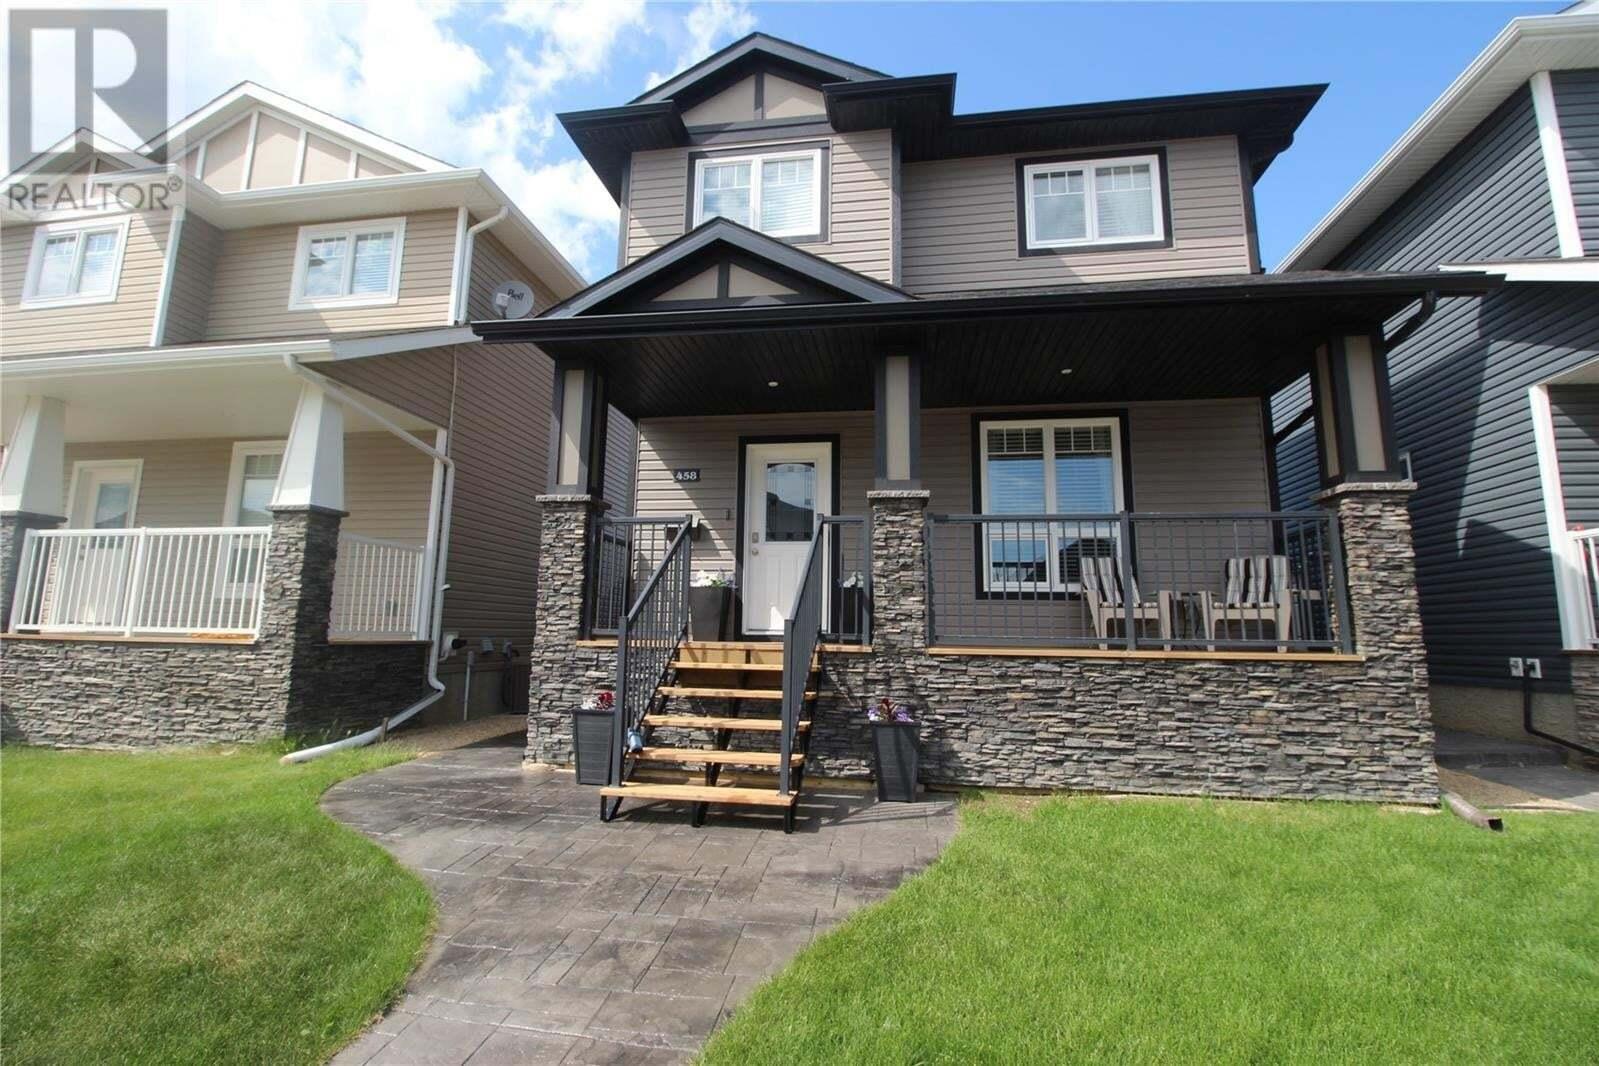 House for sale at 458 Kloppenburg St Saskatoon Saskatchewan - MLS: SK811673